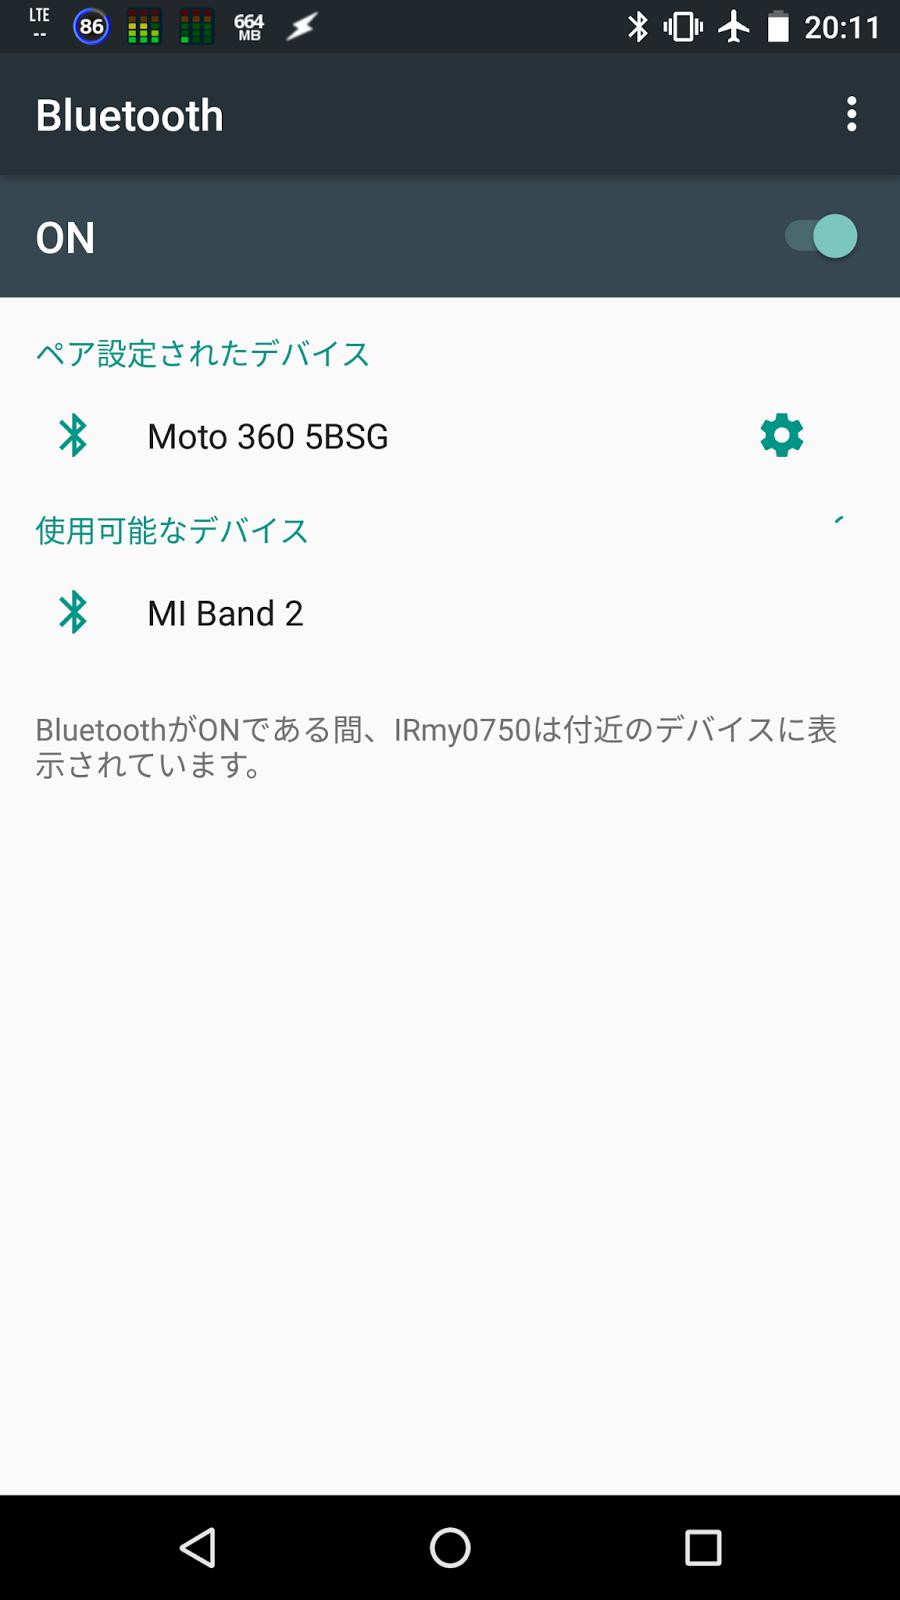 mi band 2 ファームウェア